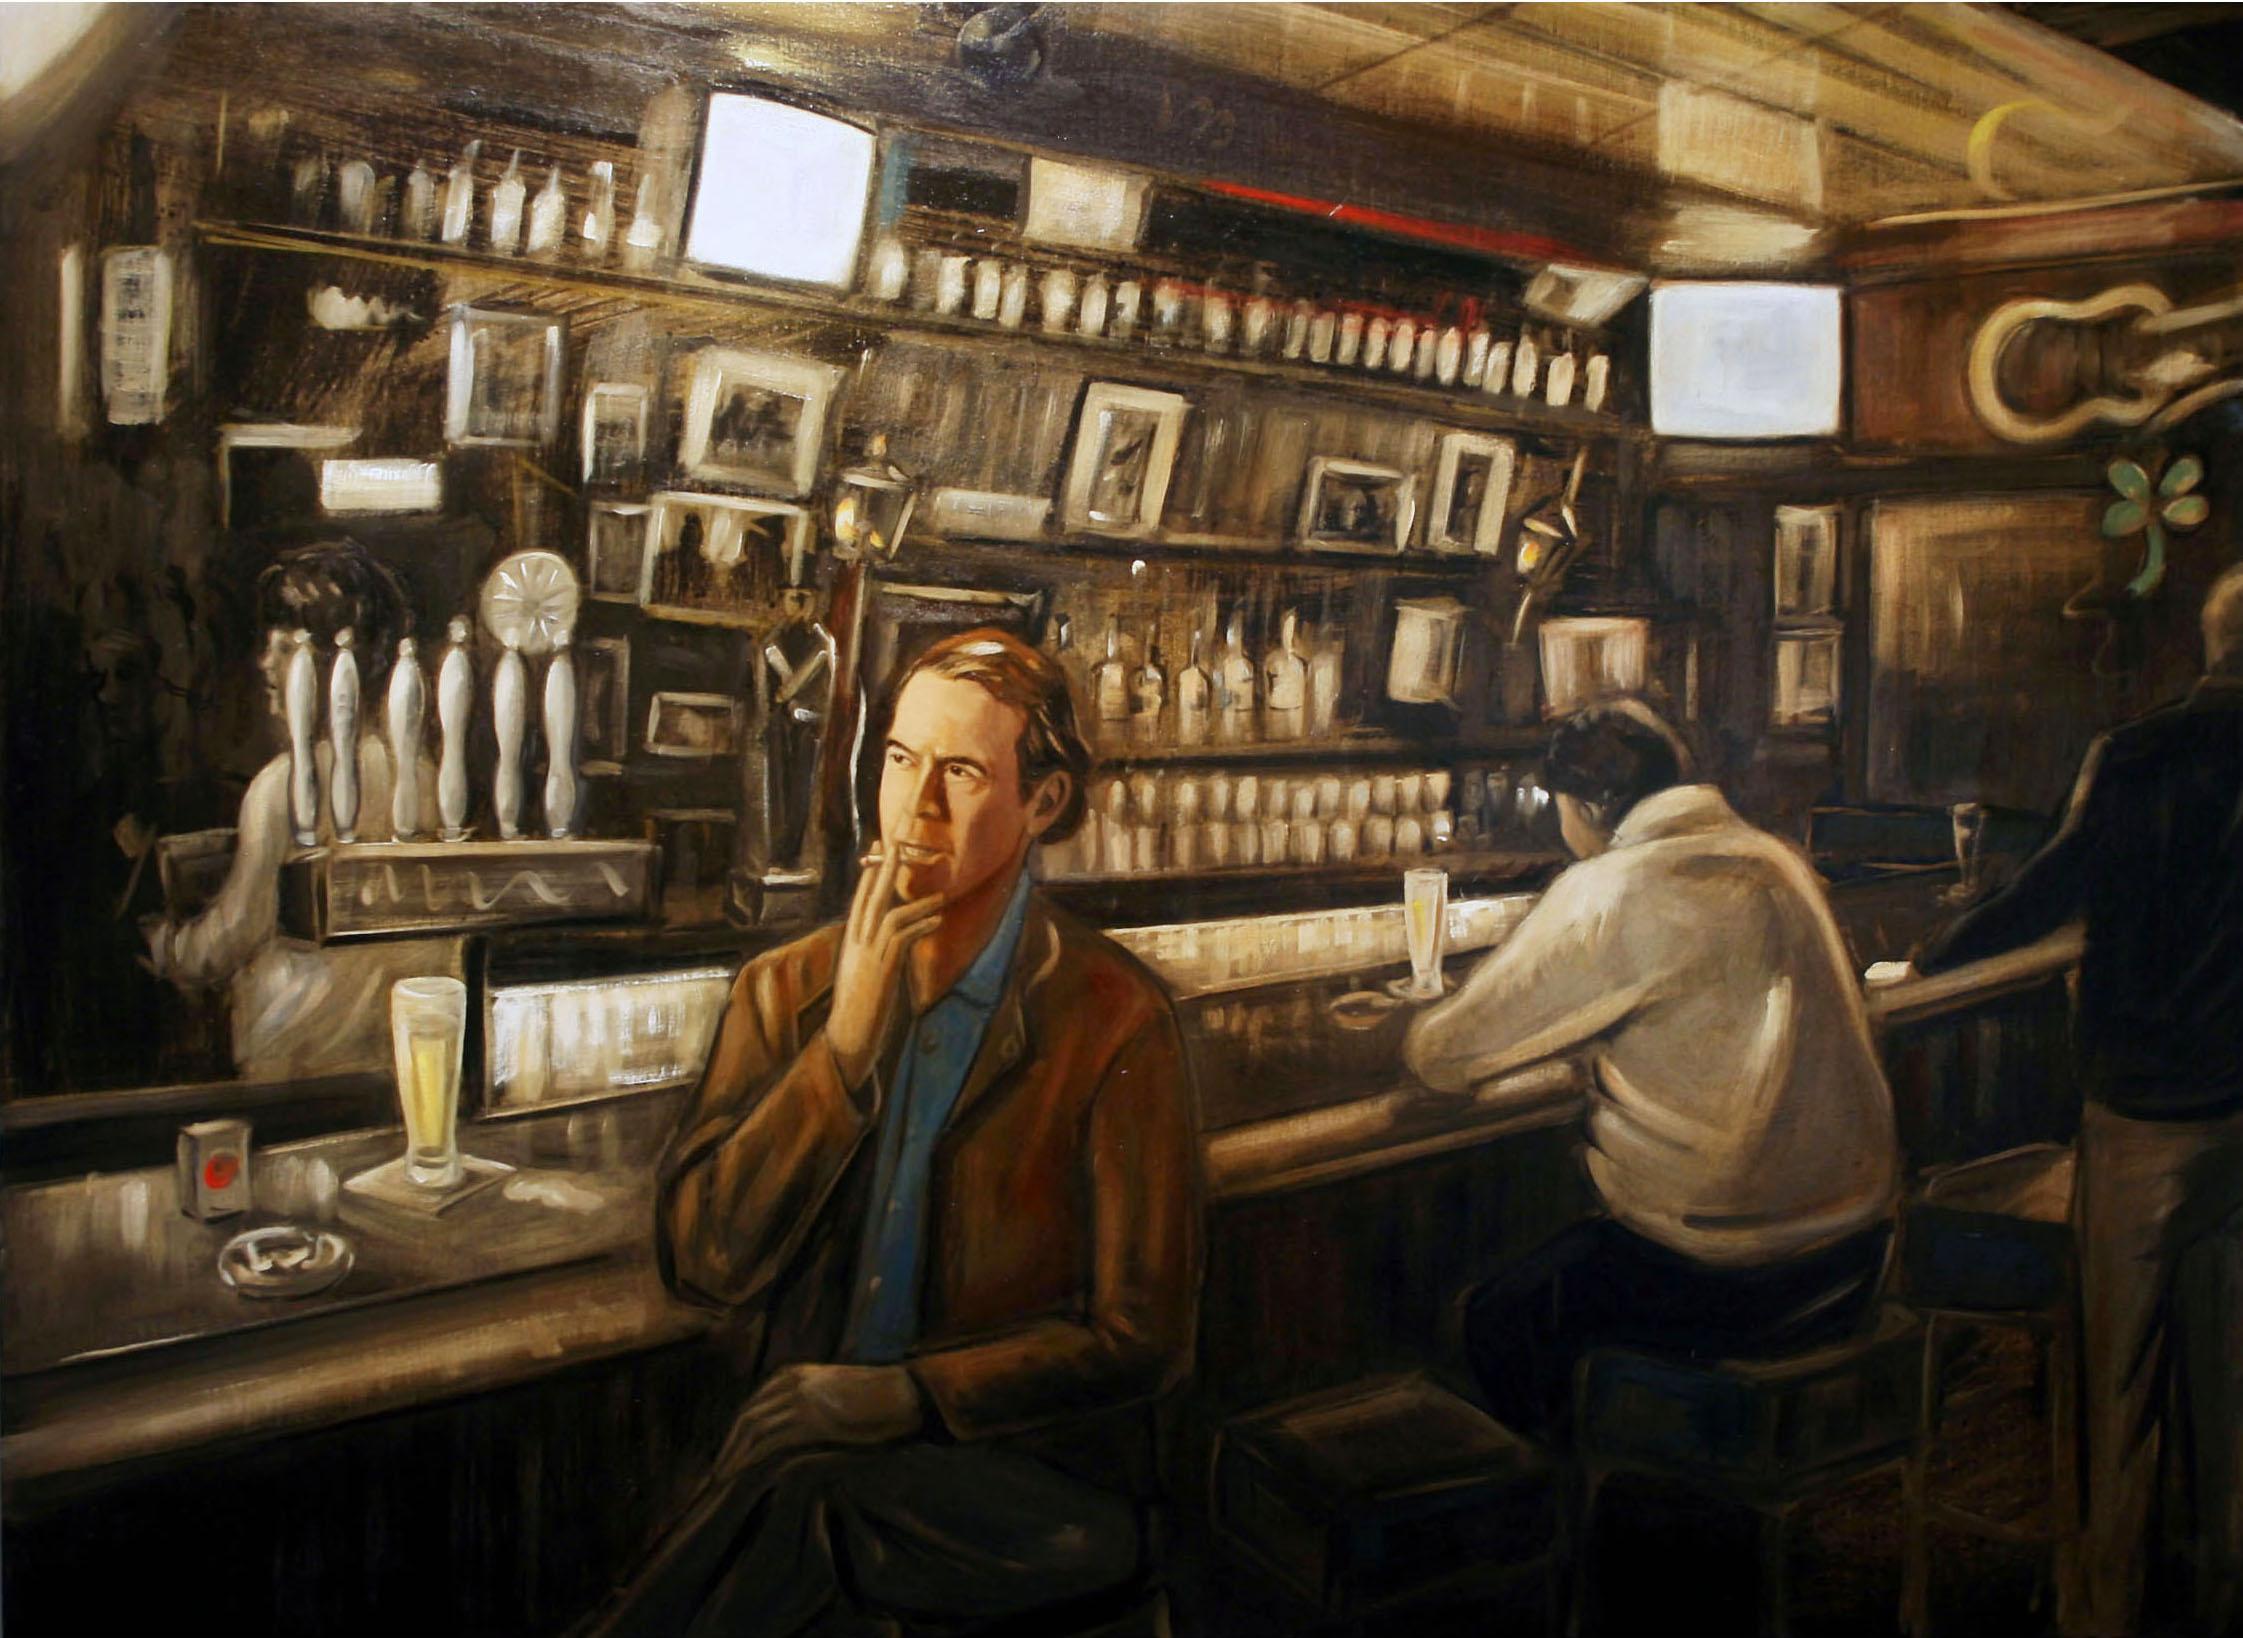 Raul Guerrero  Guy de Cointet c. 1978: Glens of Antrim Bar, Santa Monica, 2014 Oil on linen 34 x 46 inches (86.4 x 116.8 centimeters)